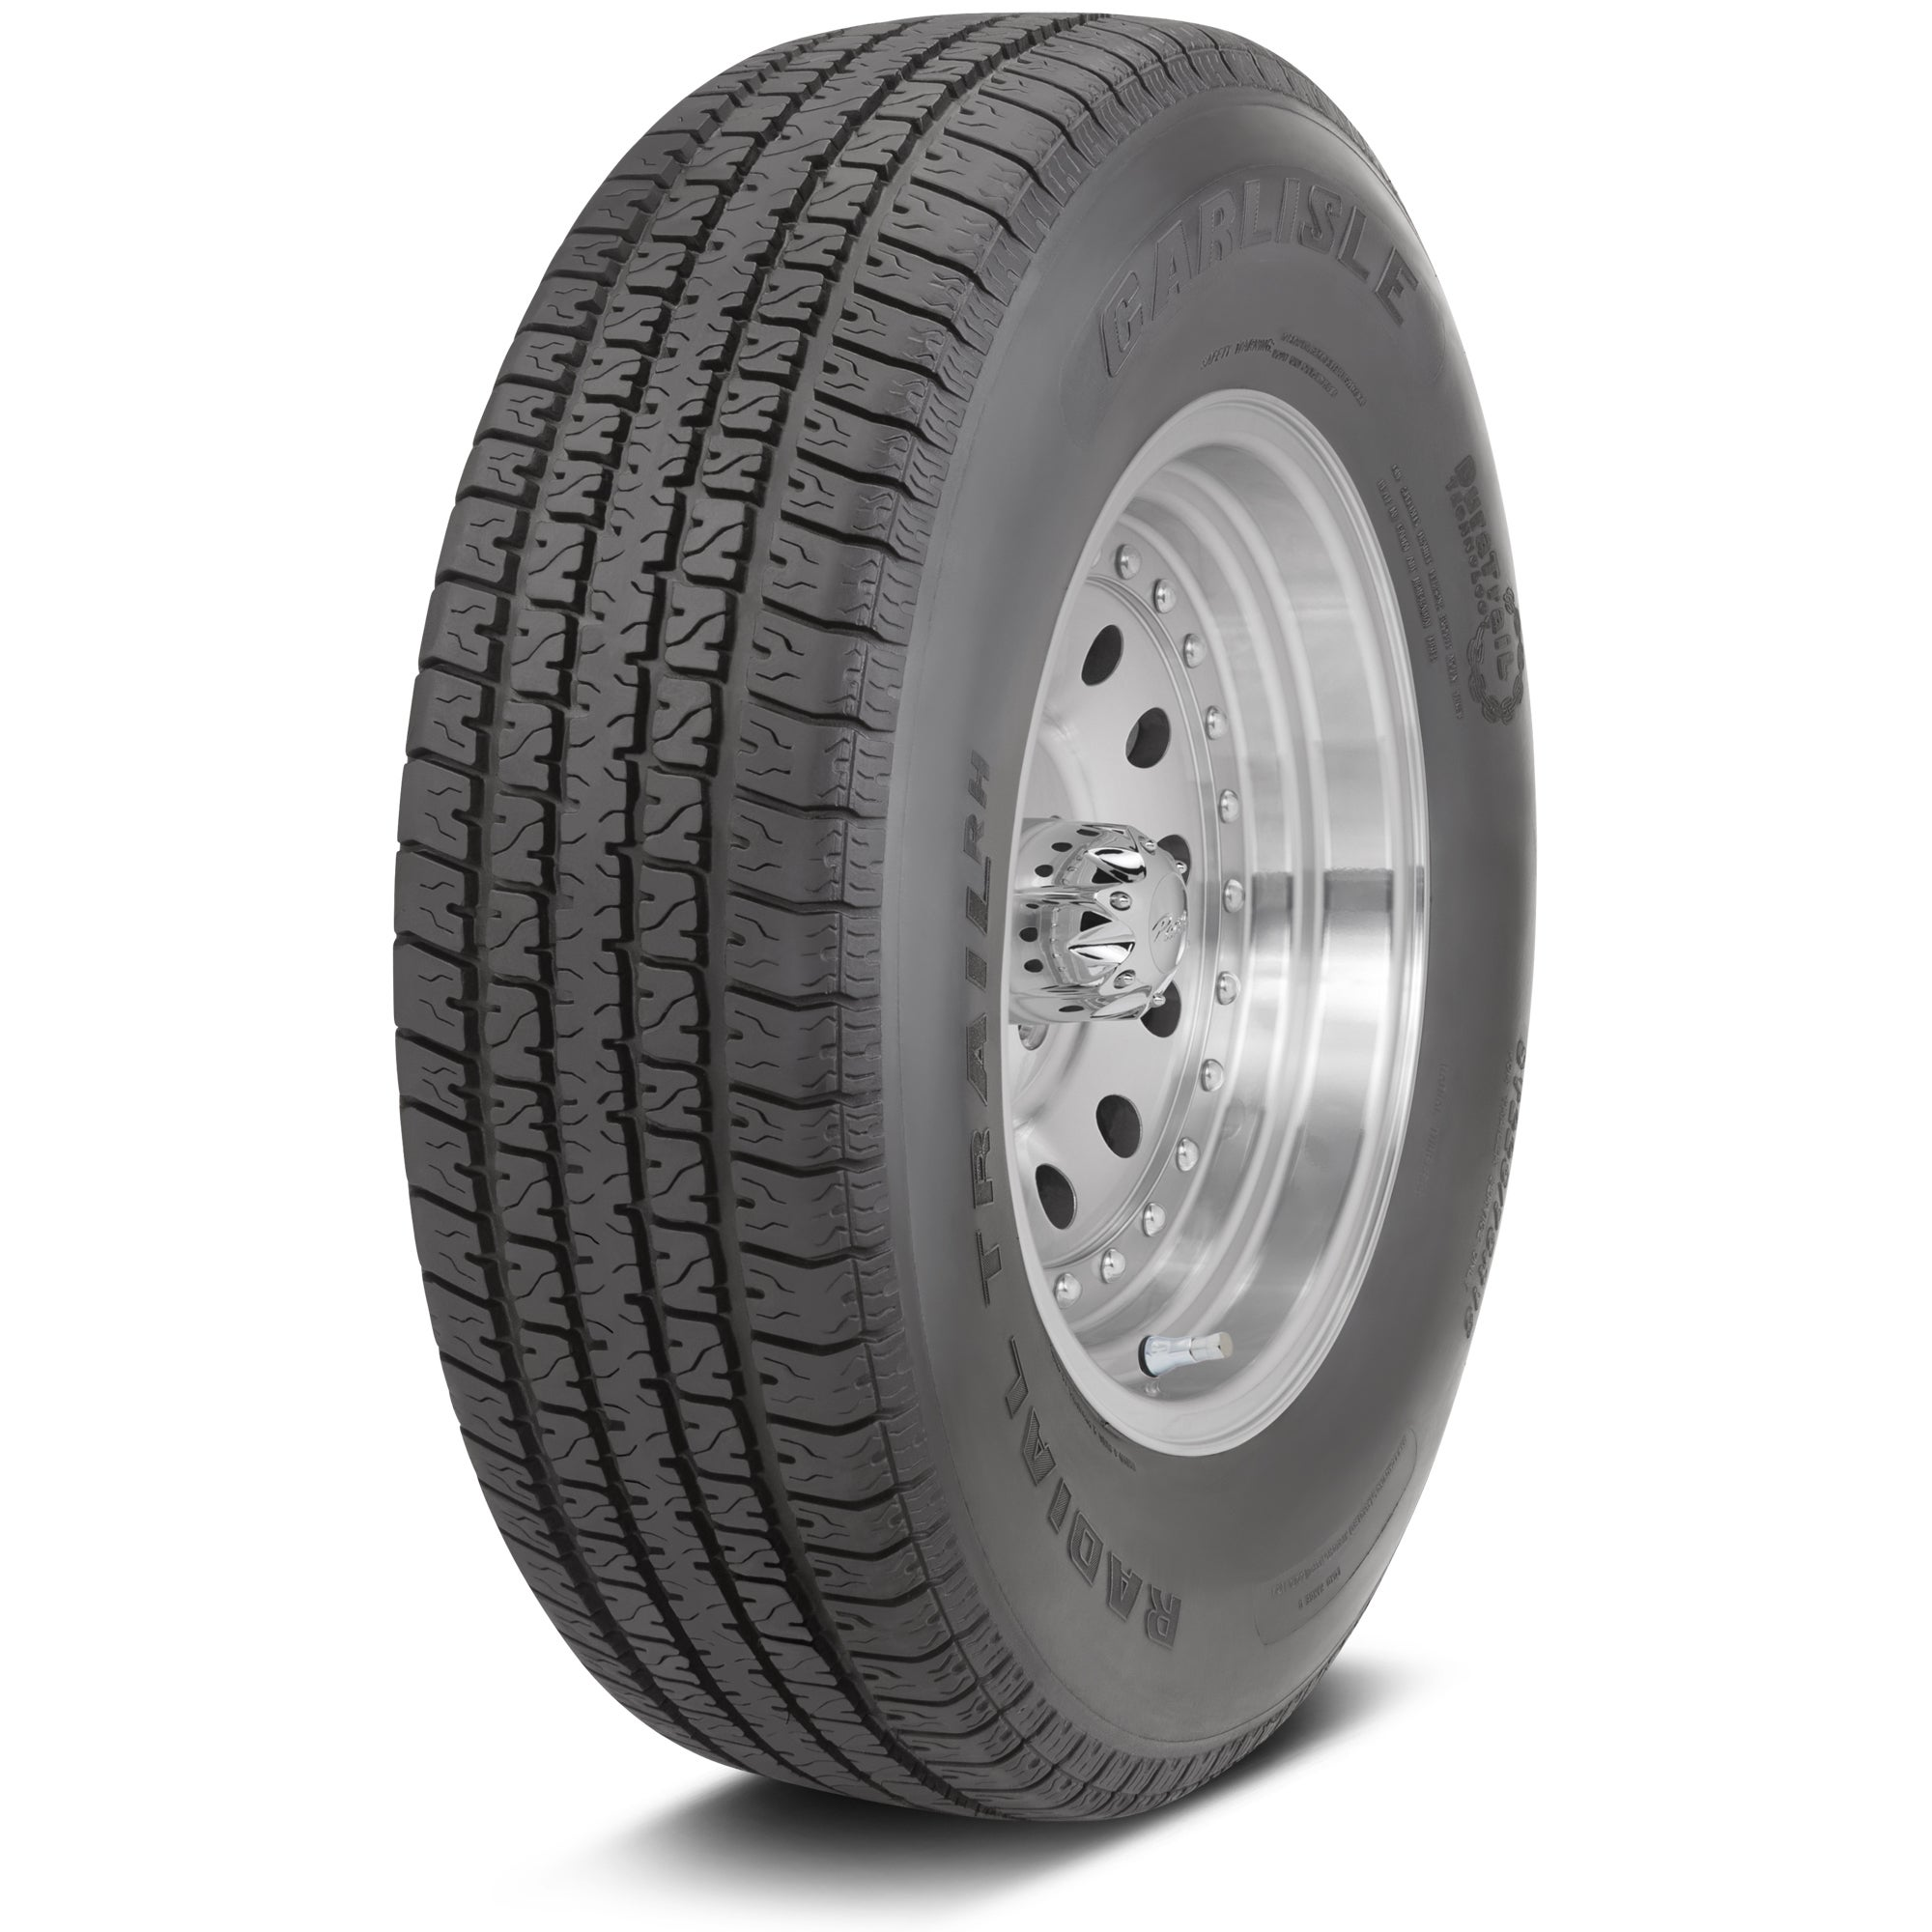 Carlisle Radial Trail RH Trailer Tire - ST145R12 LRD/8 pl...